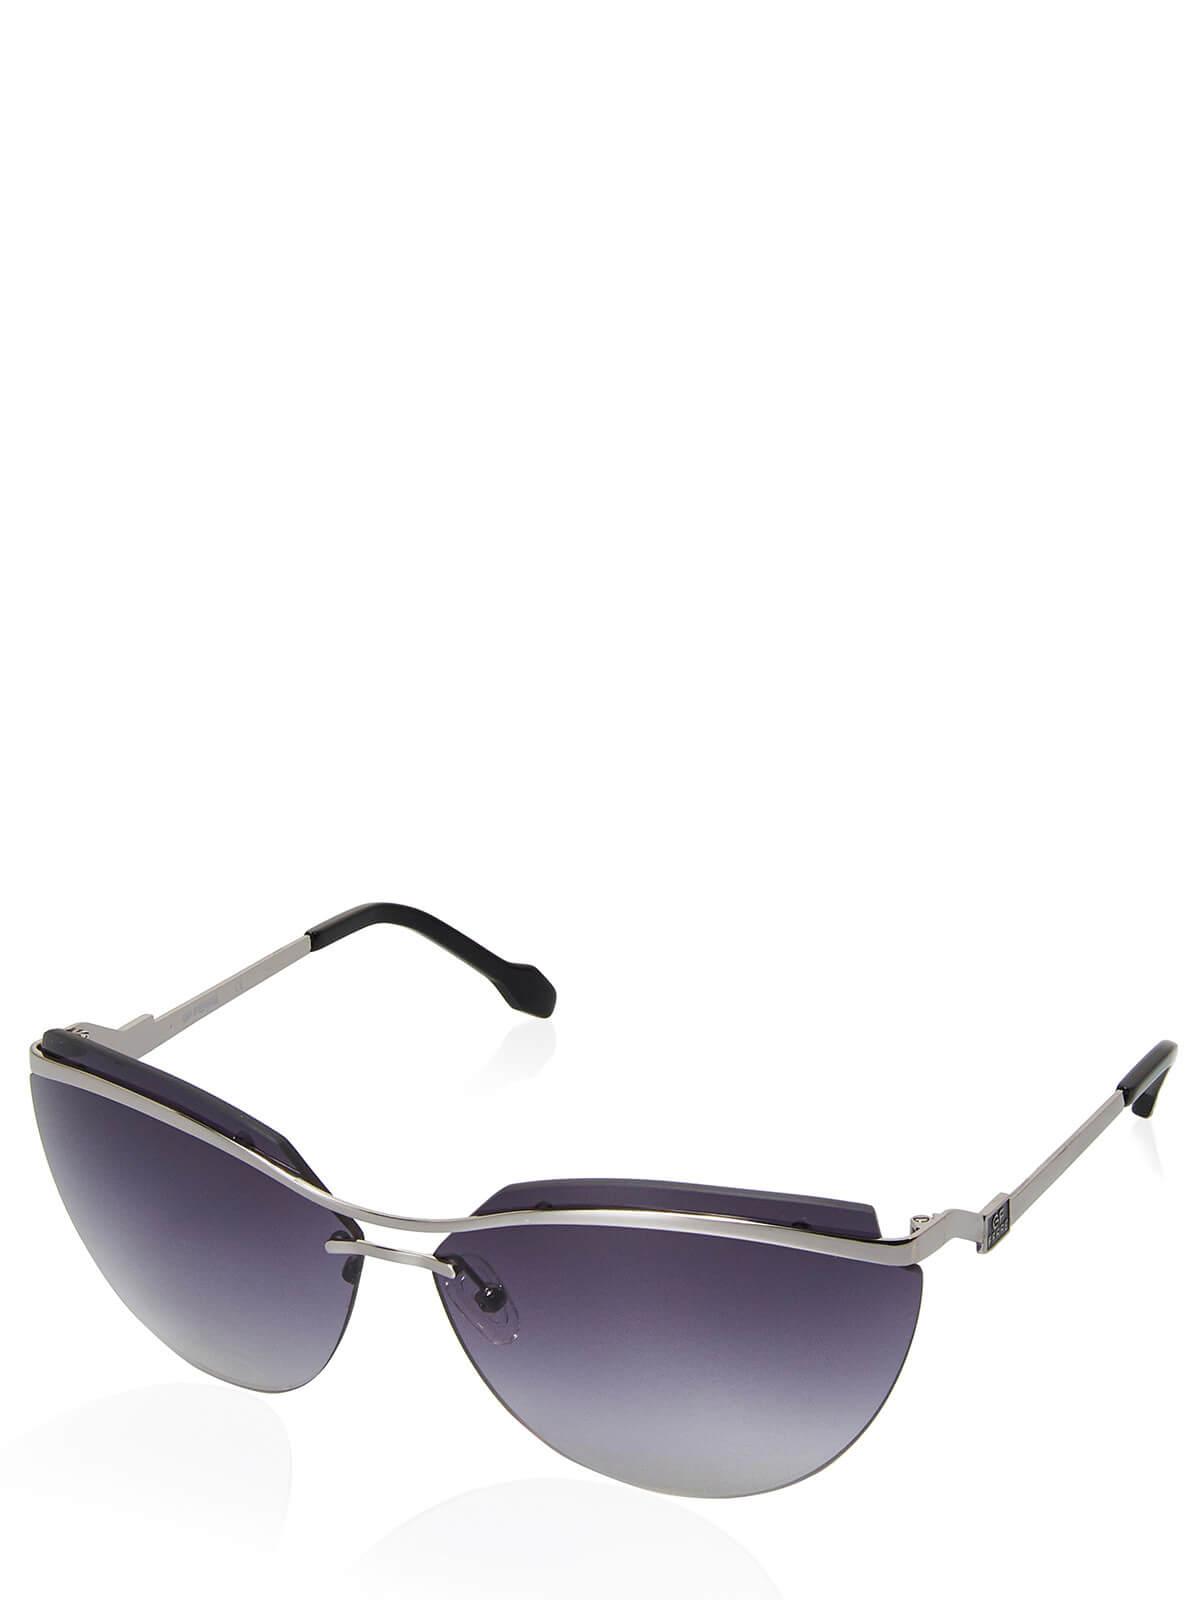 a08e8fe2a47 Gianfranco Ferre Sunglasses silver